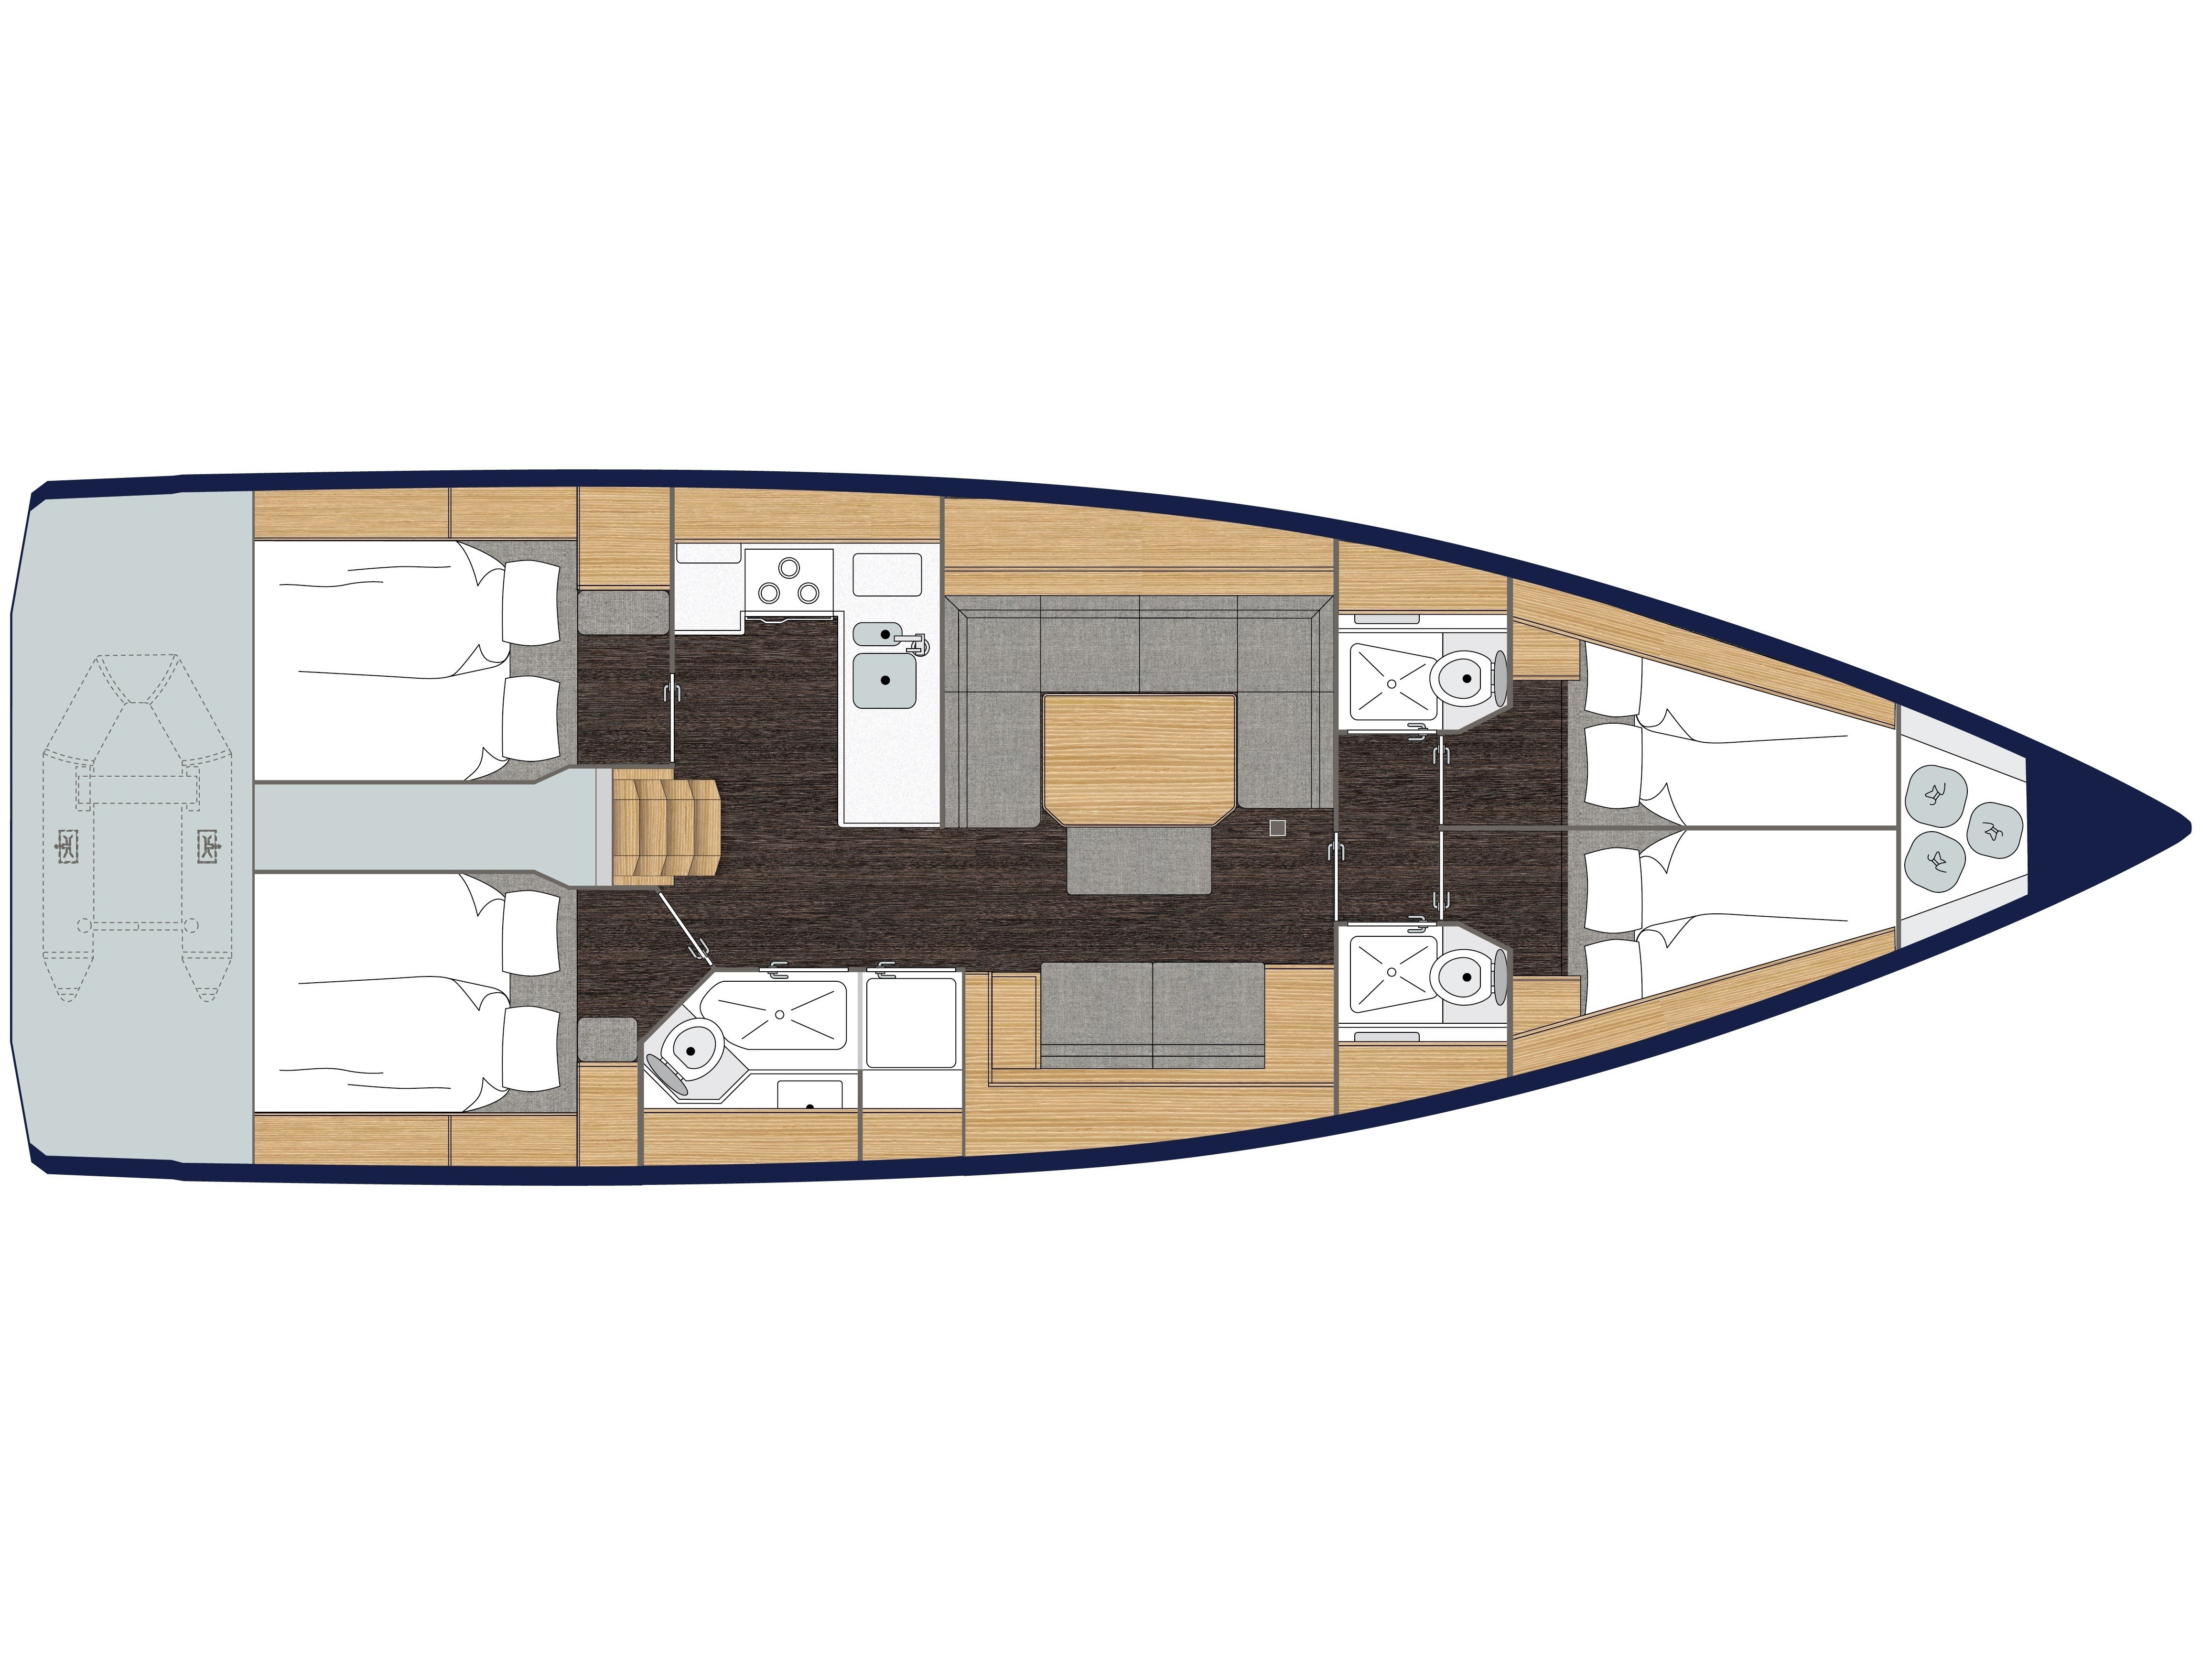 S/Y - Bavaria C45 - 4 Cabins - Built 2019